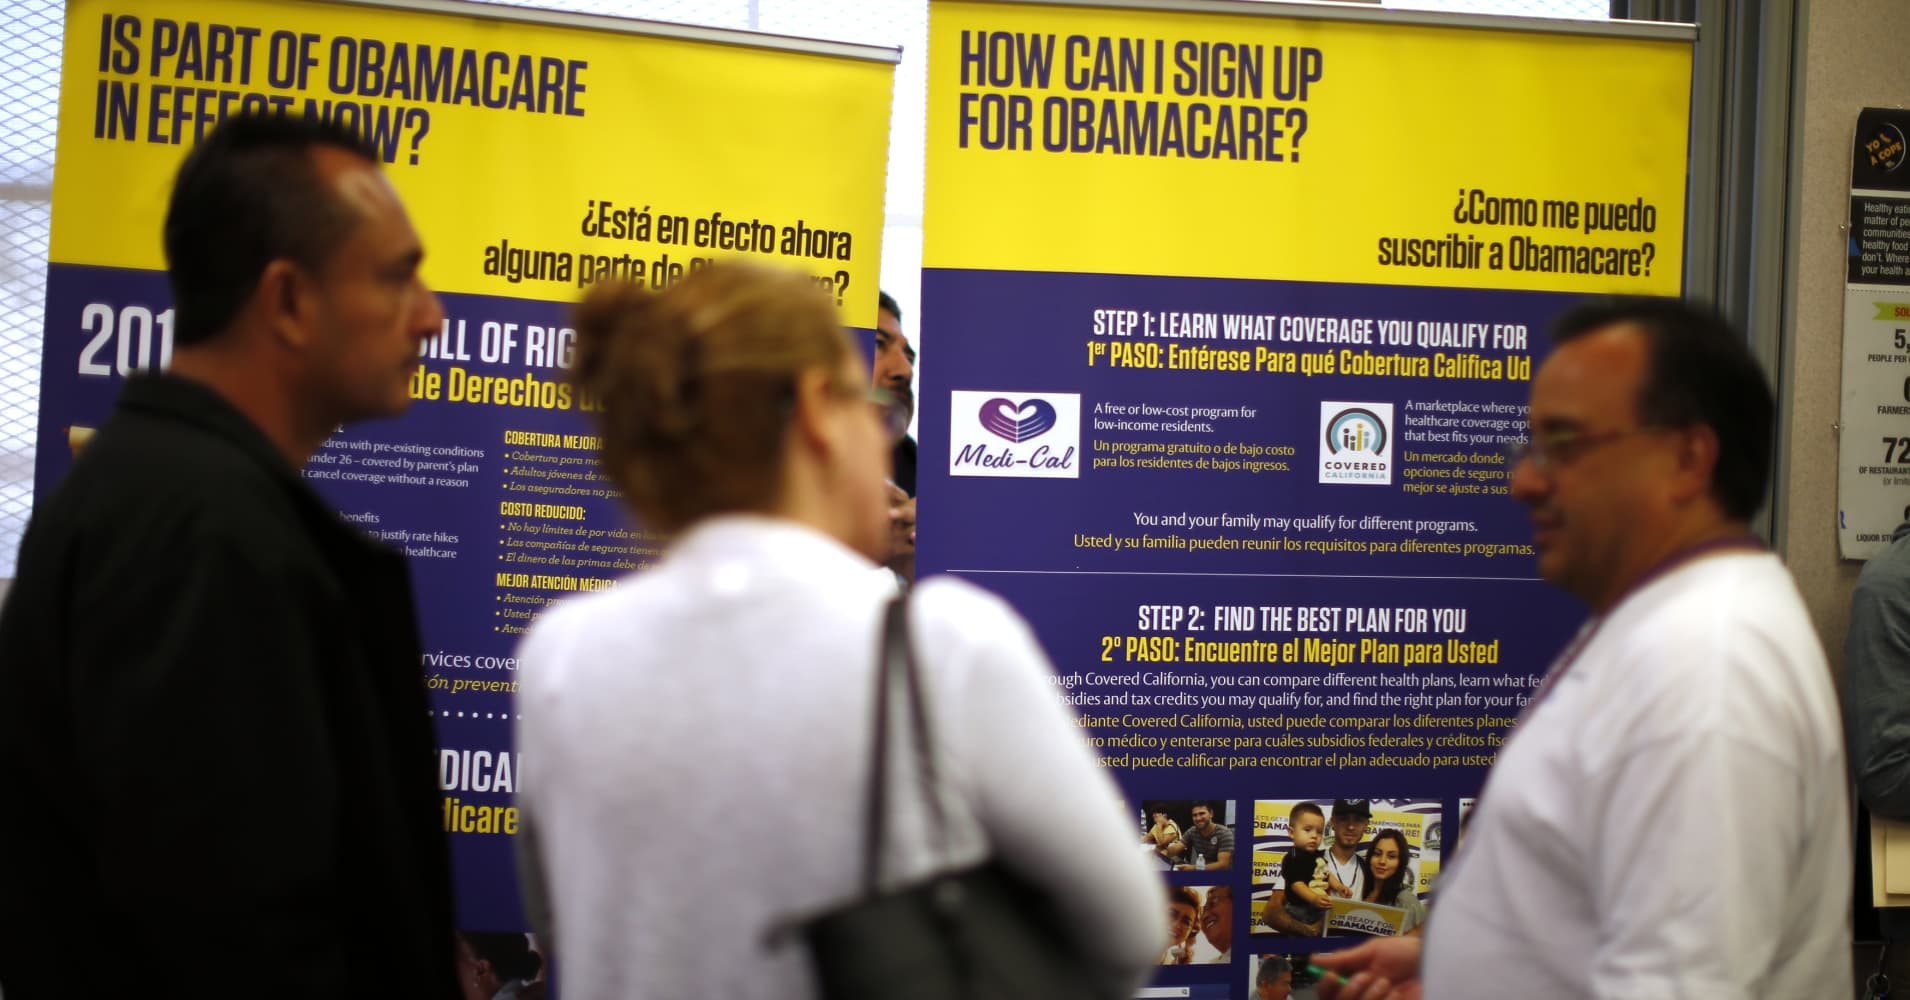 US Republicans Prepare Plan to Deactivate Obamacare in 2017